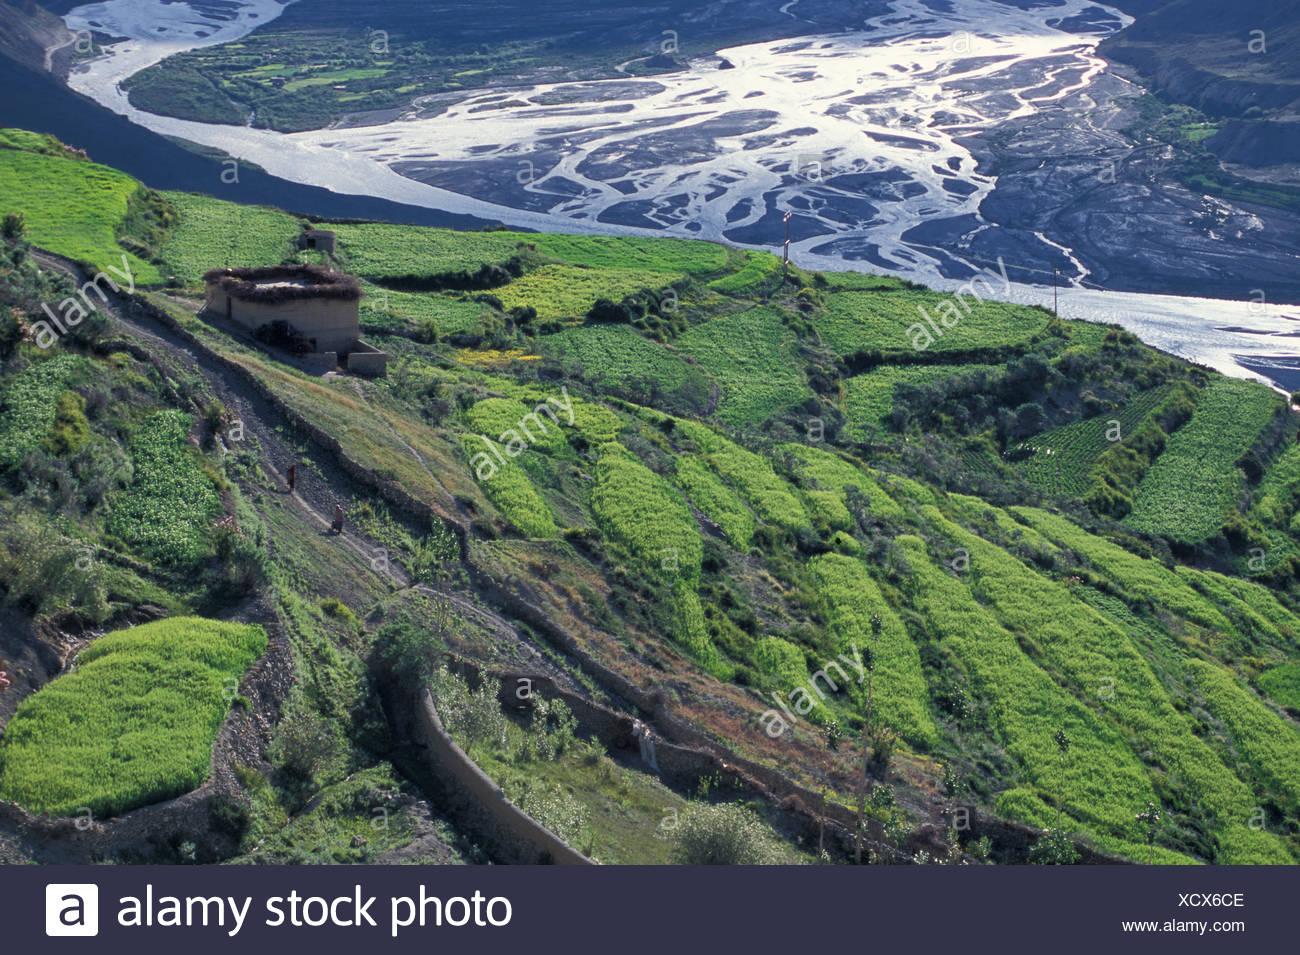 Champs, Dhankar, Spiti, Himachal Pradesh, Himalaya, Inde du Nord, Inde, Asie Photo Stock